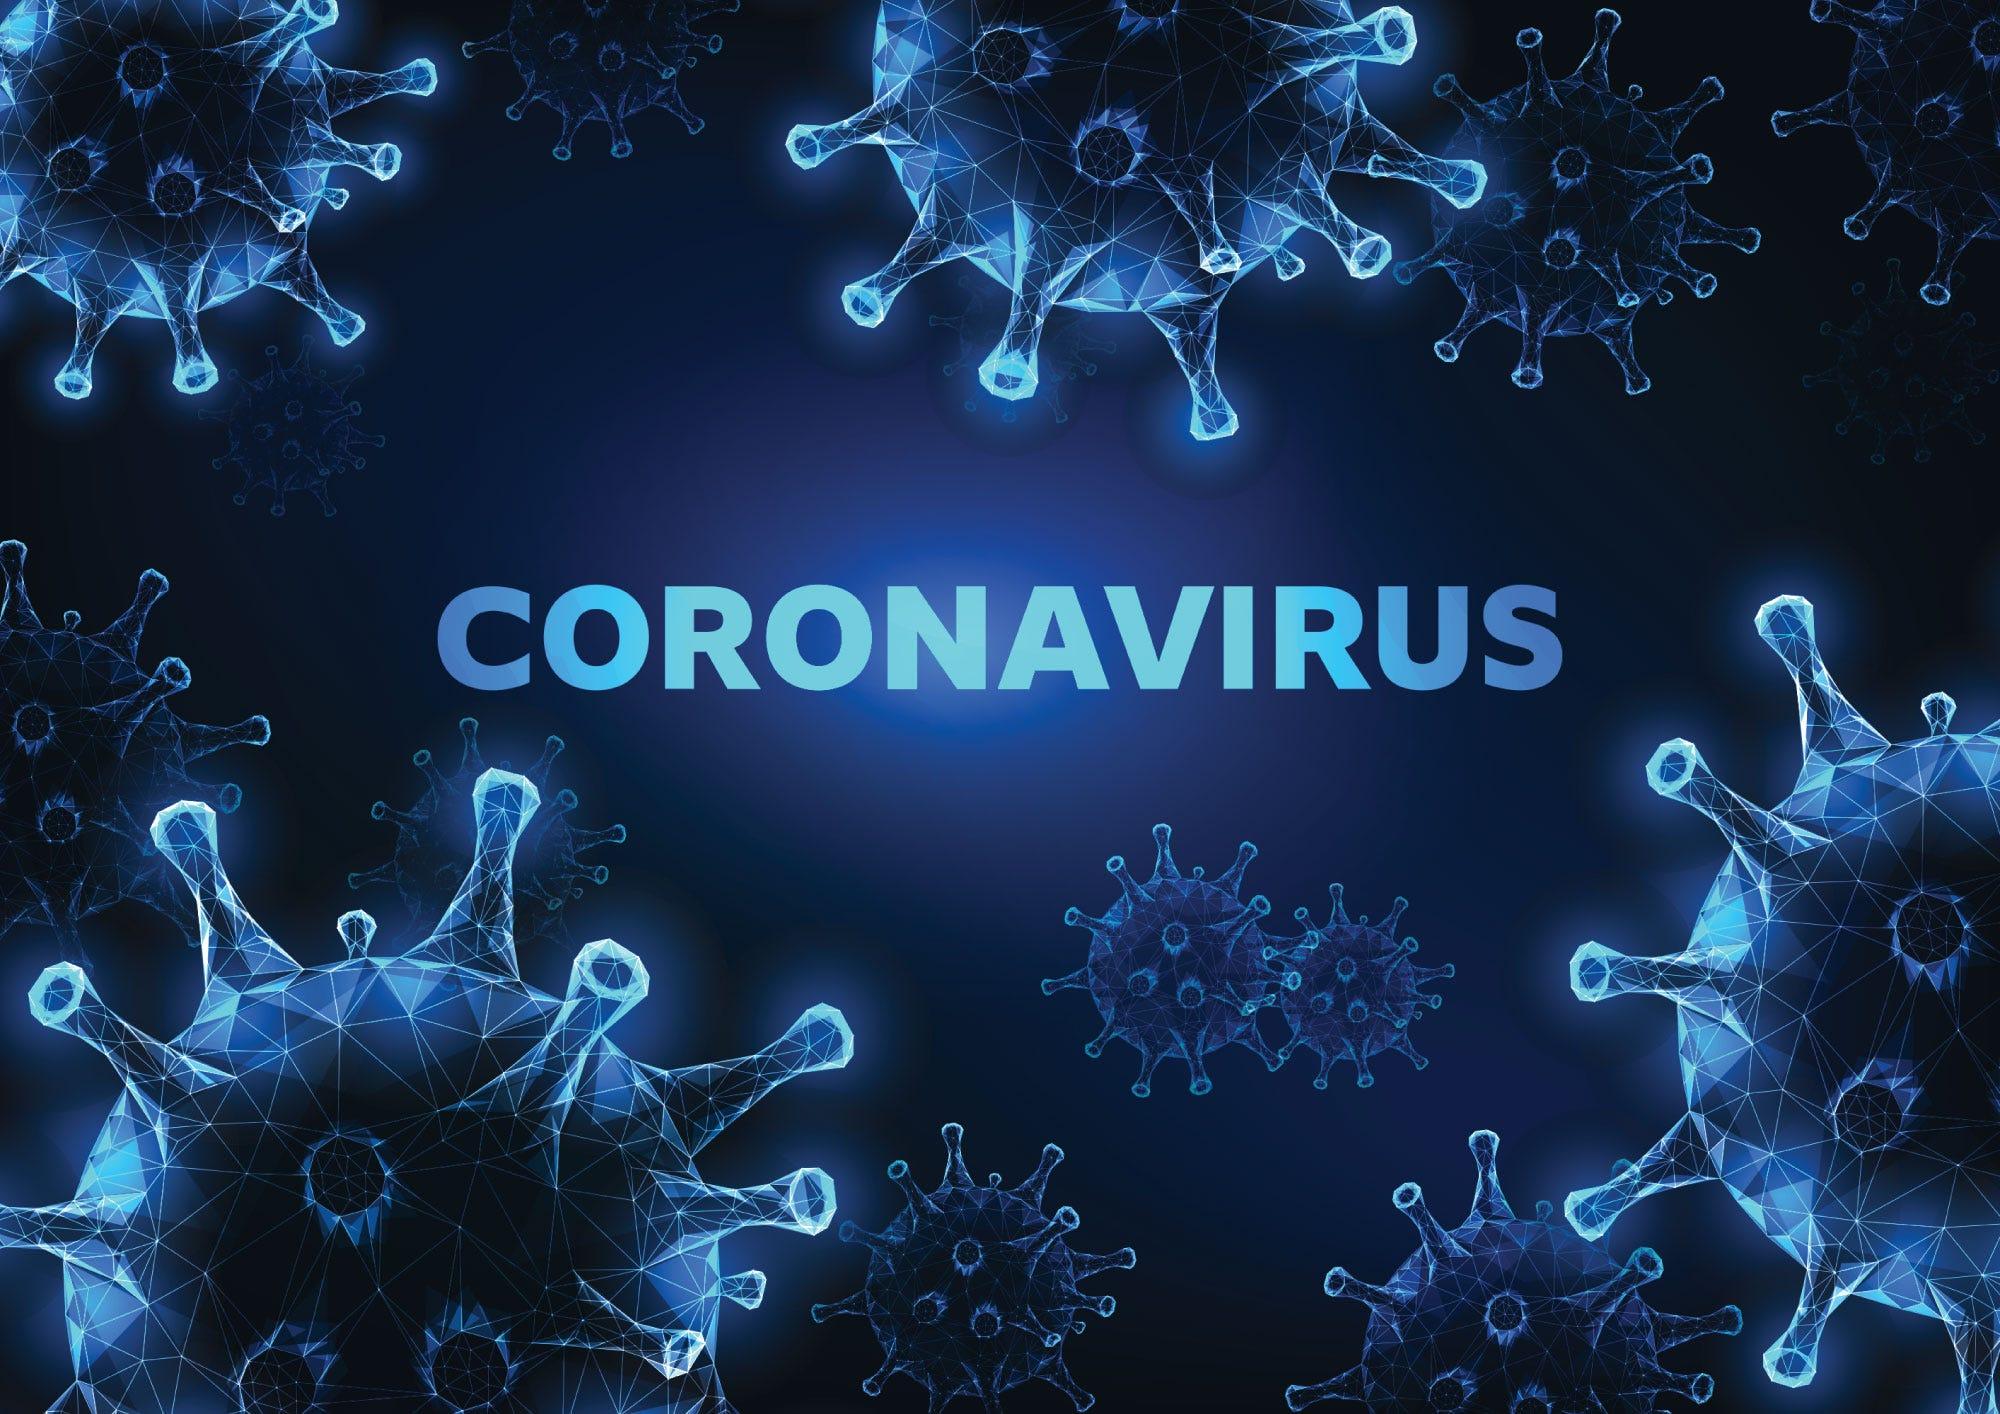 Coronavirus: Pa. senator wants to suspend HIPAA amid COVID-19 pandemic